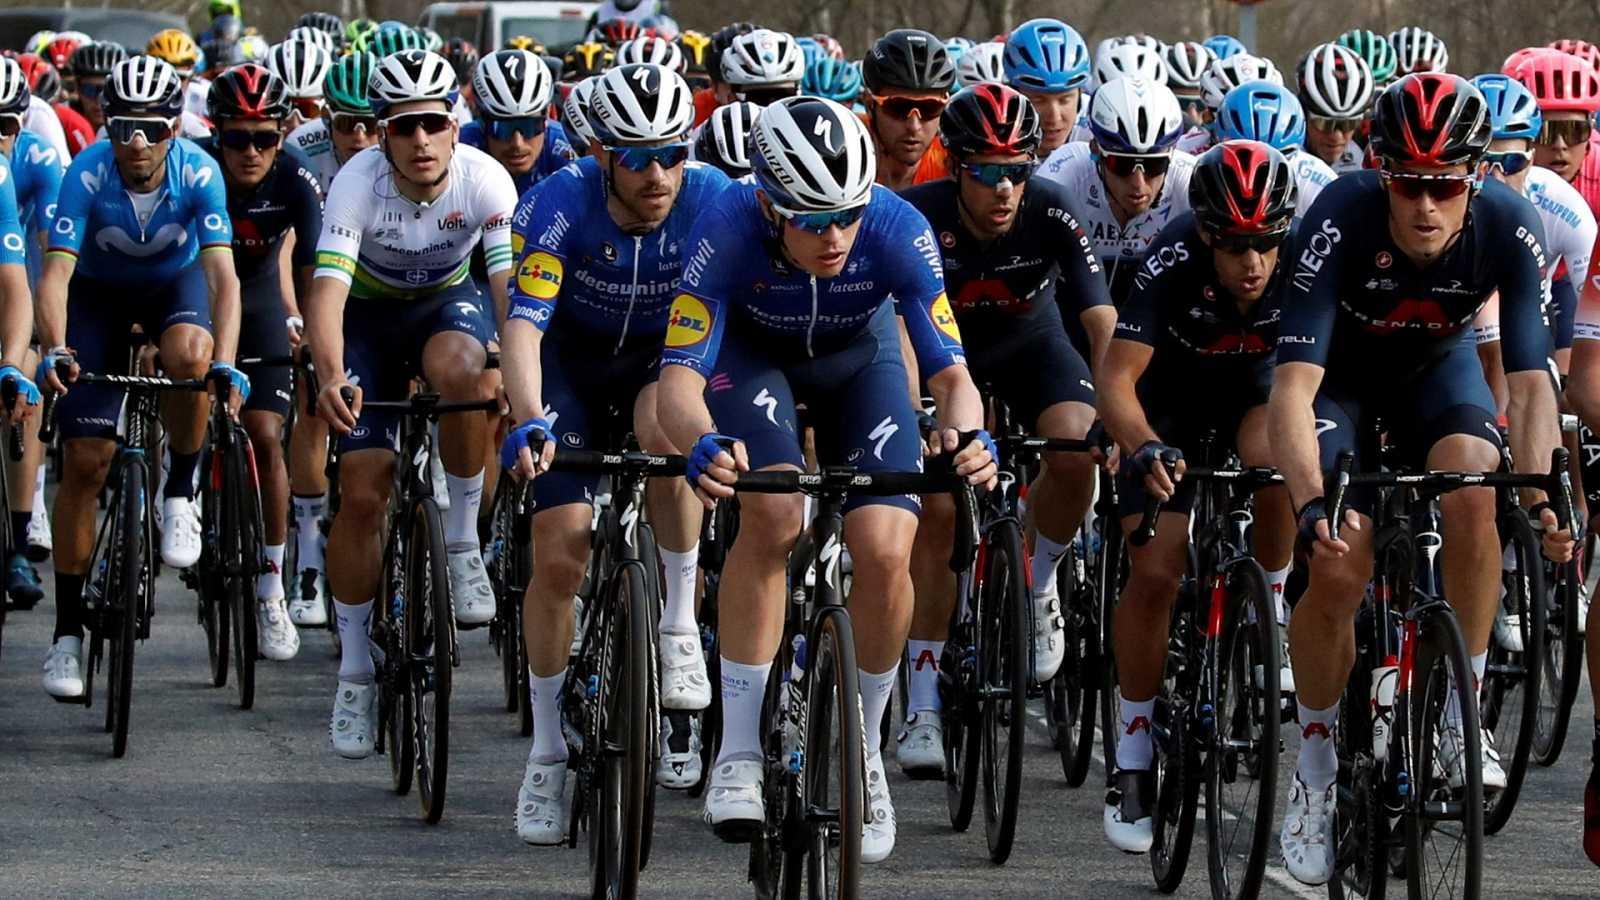 Ciclismo - Volta Cataluña. 4ª etapa: Ripoll - Port Ainé - ver ahora